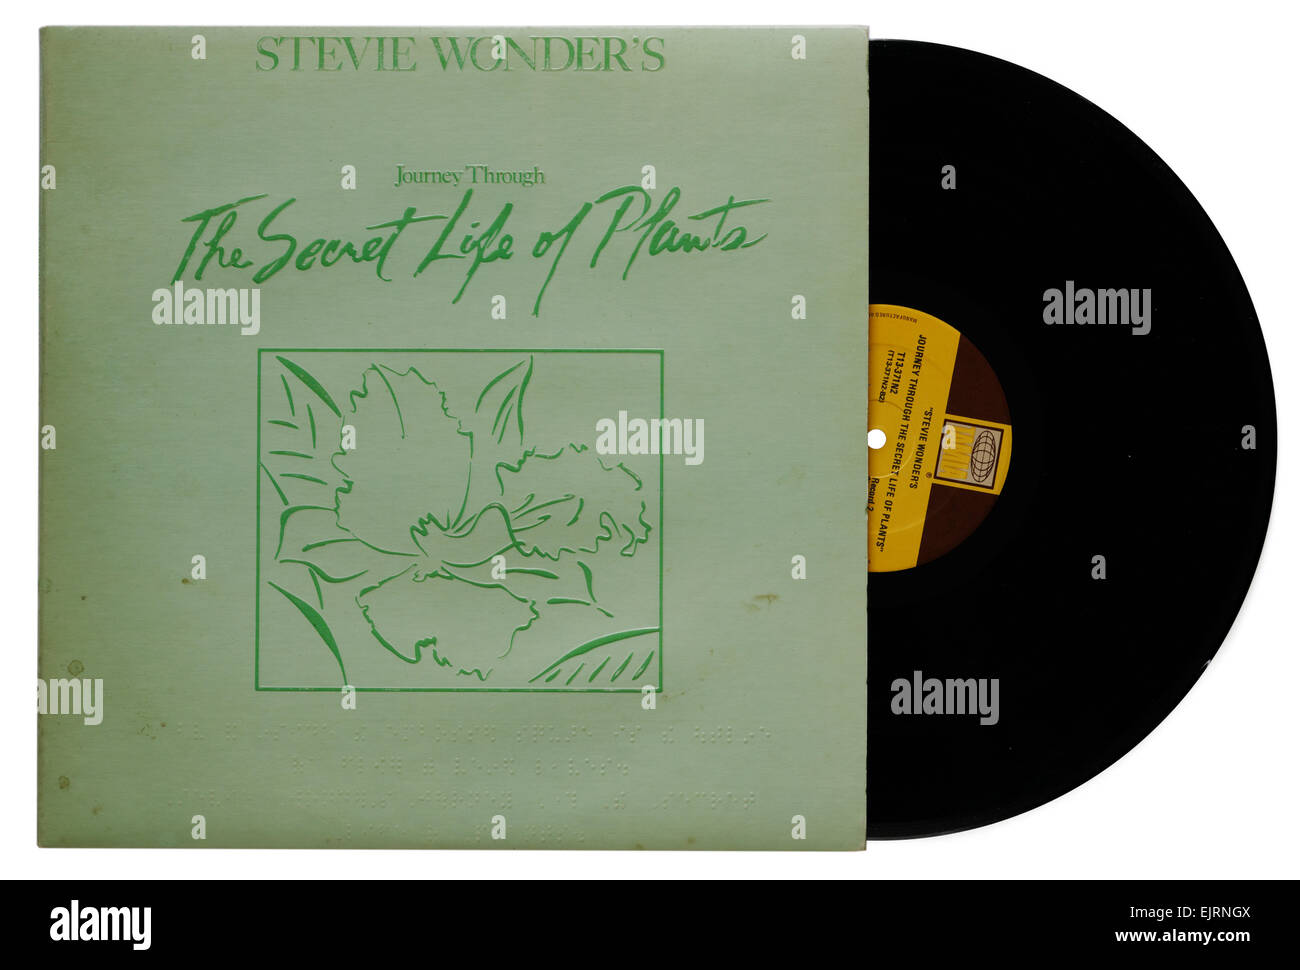 Stevie Wonder Journey Through the Secret Life of Plants album - Stock Image